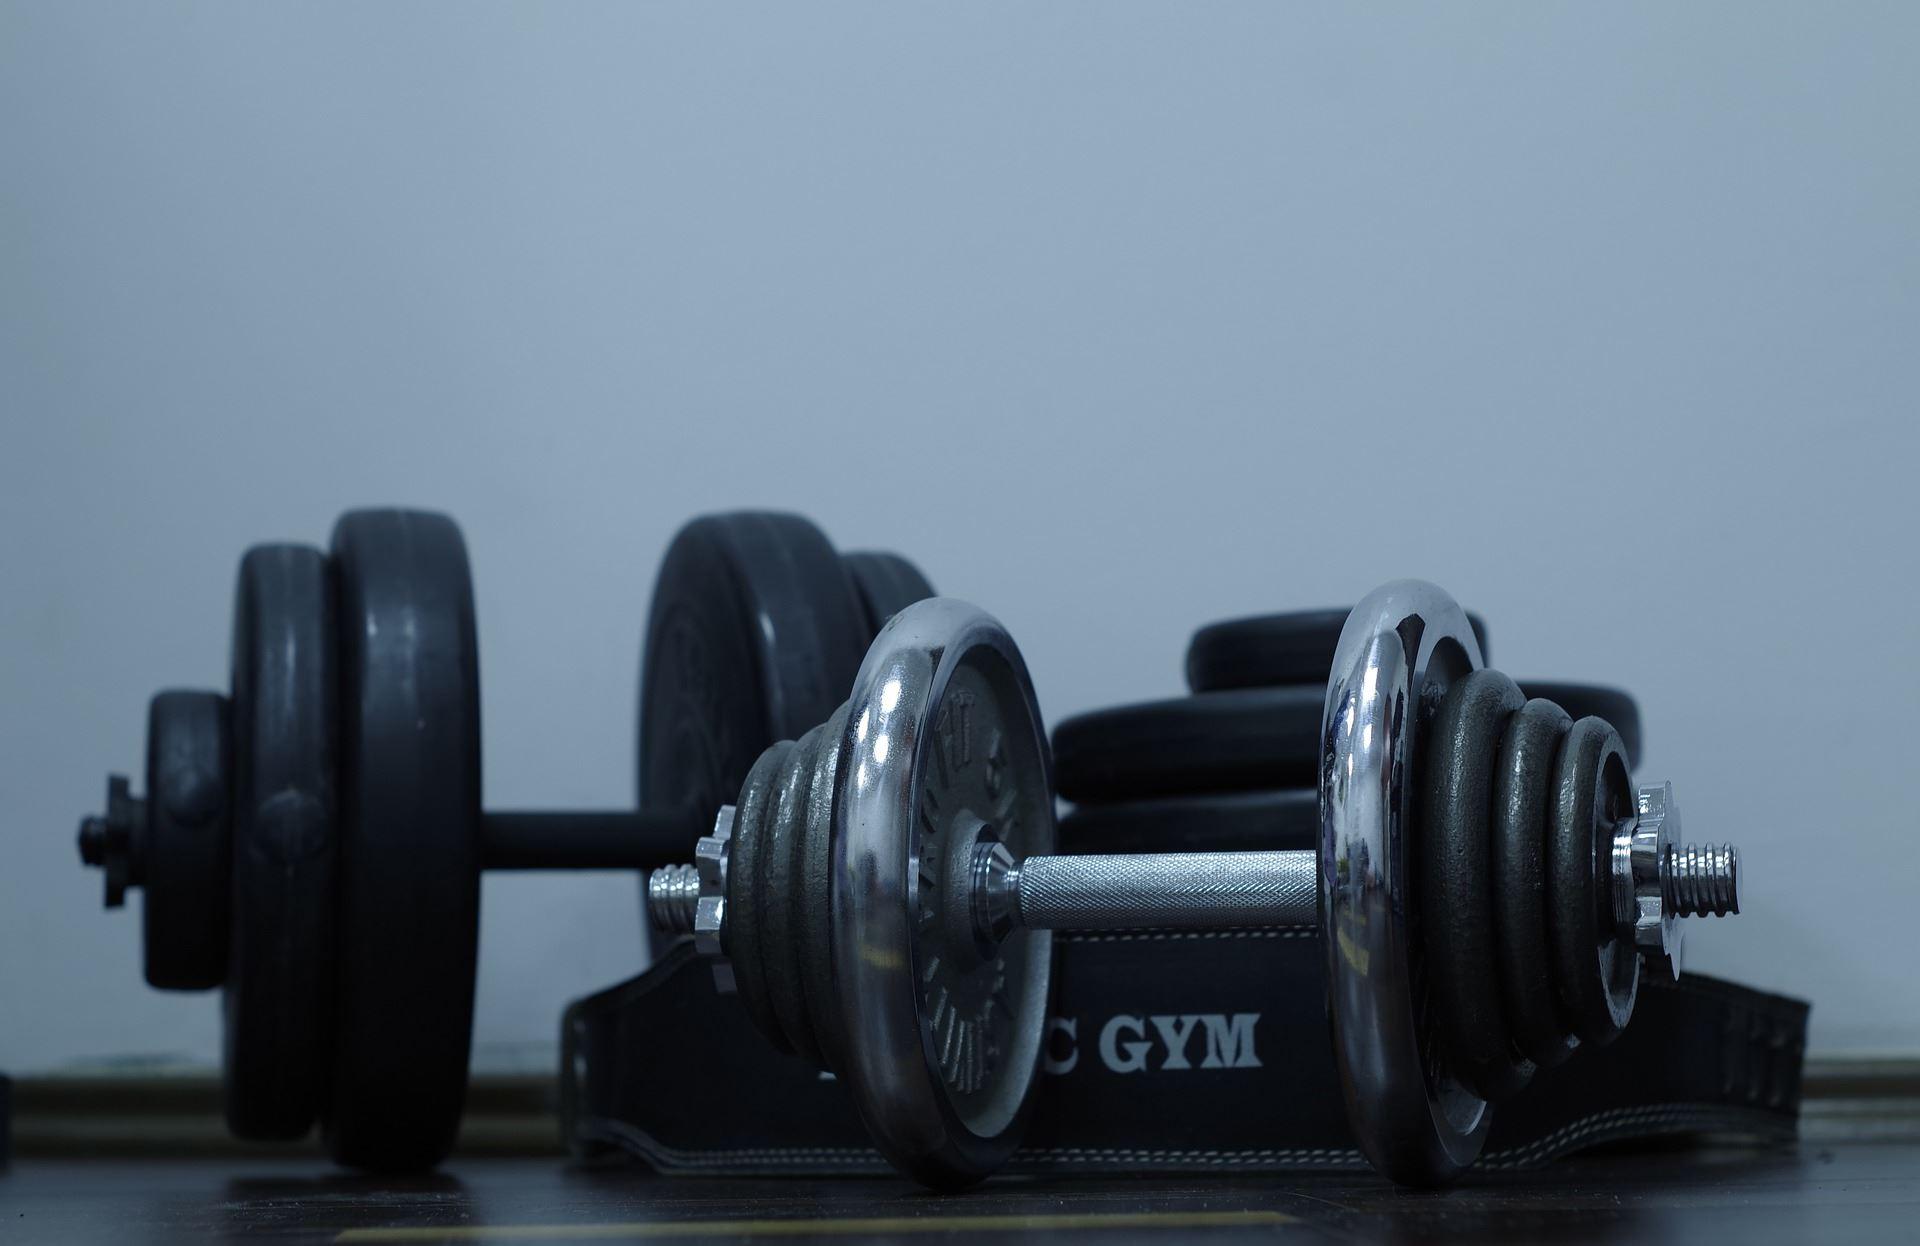 sport-1244925_1920